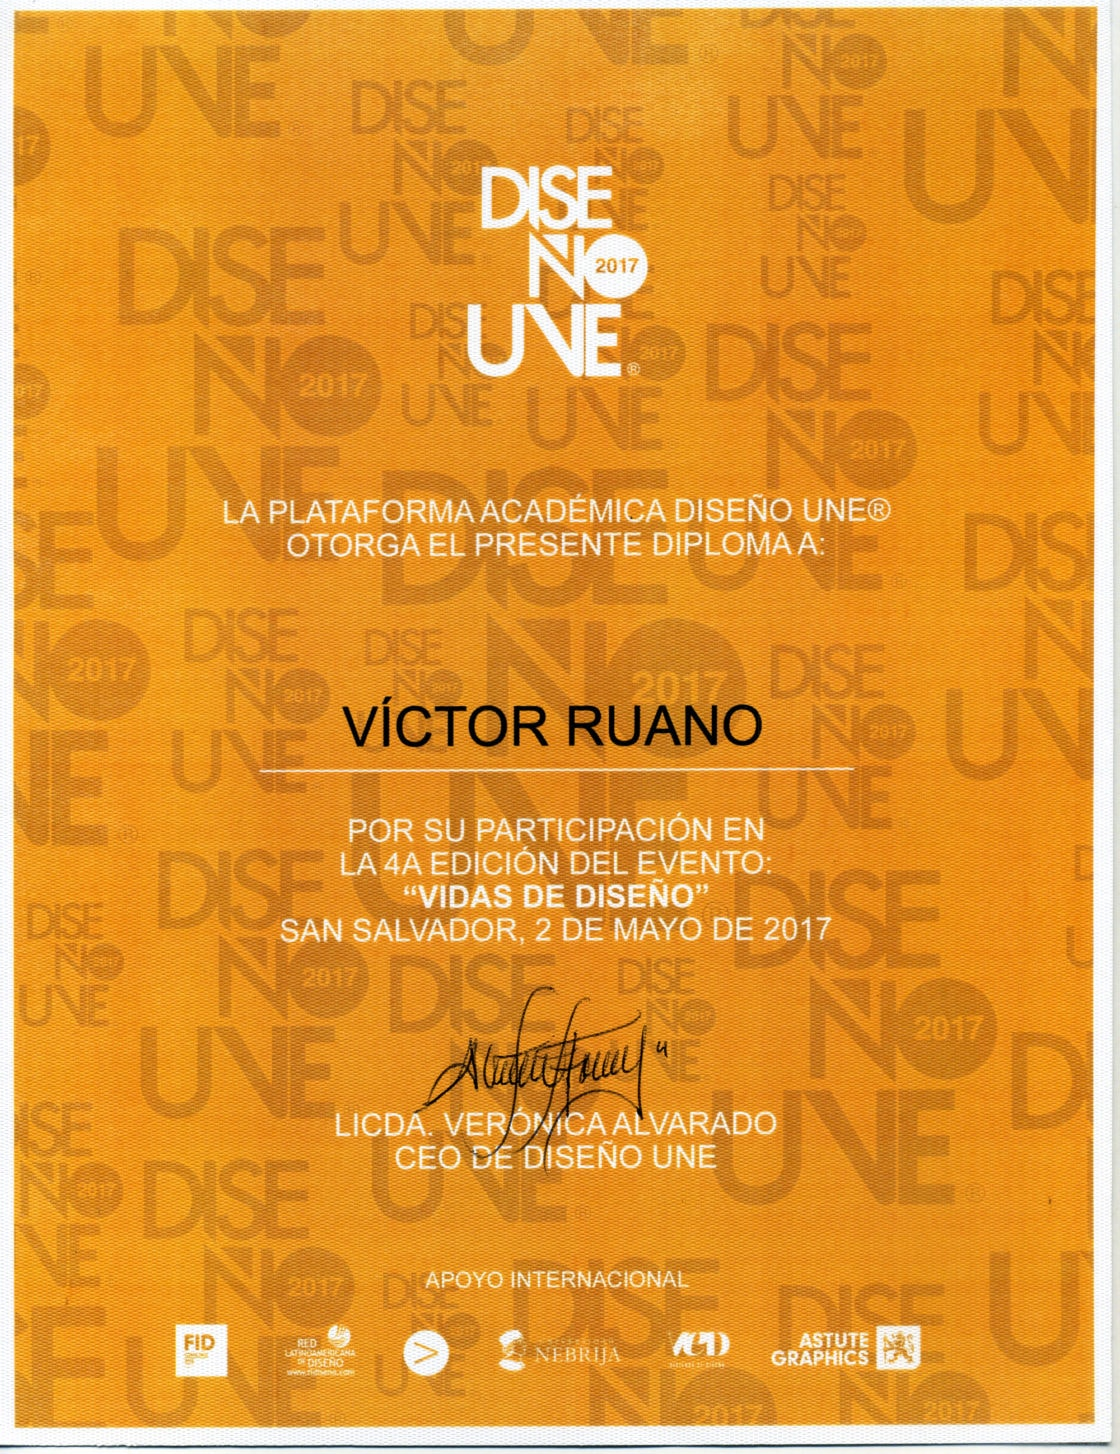 diploma-disenoune-victor-ruano-santasombra certificates